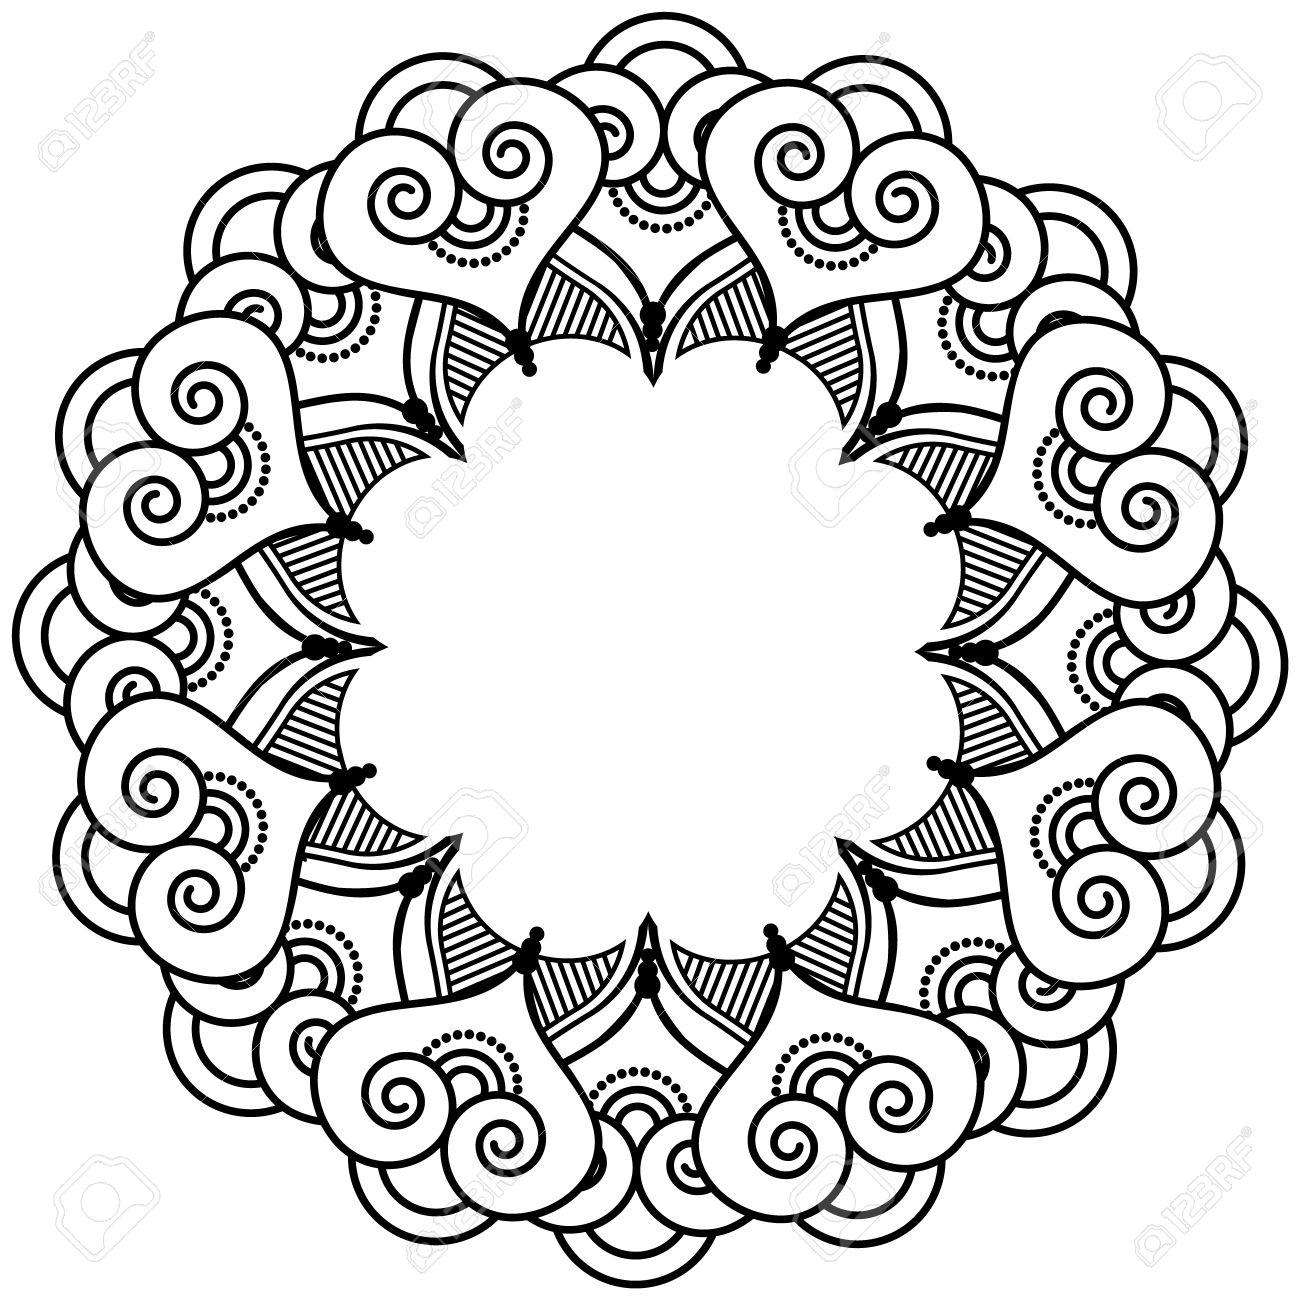 indian henna tattoo inspired flower shape with inner floral star rh 123rf com Henna Tattoo Henna Drawings Designs